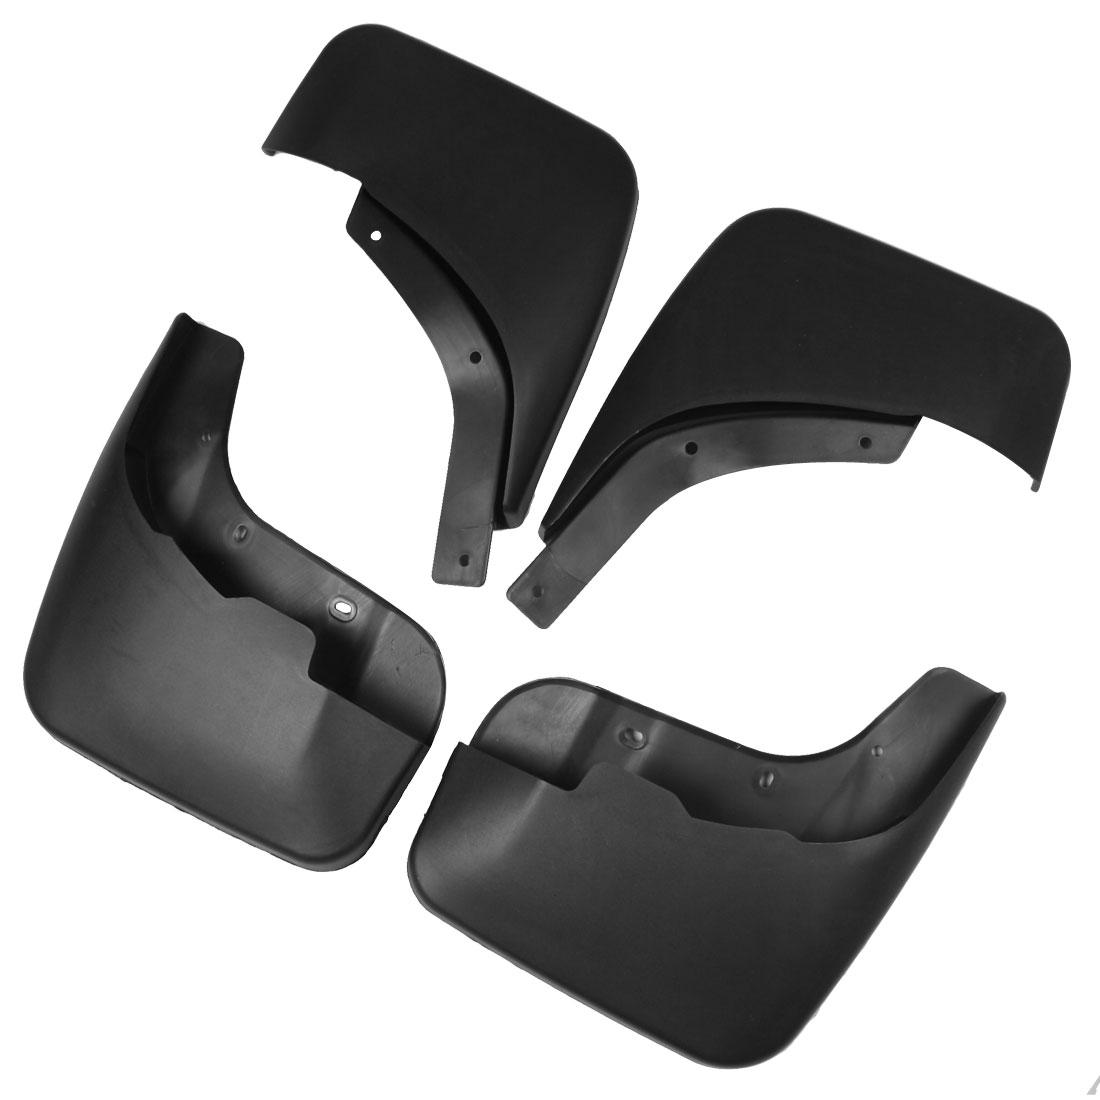 Black Plastic Splash Guards Mud Flaps Front Rear Set for Audi Q7